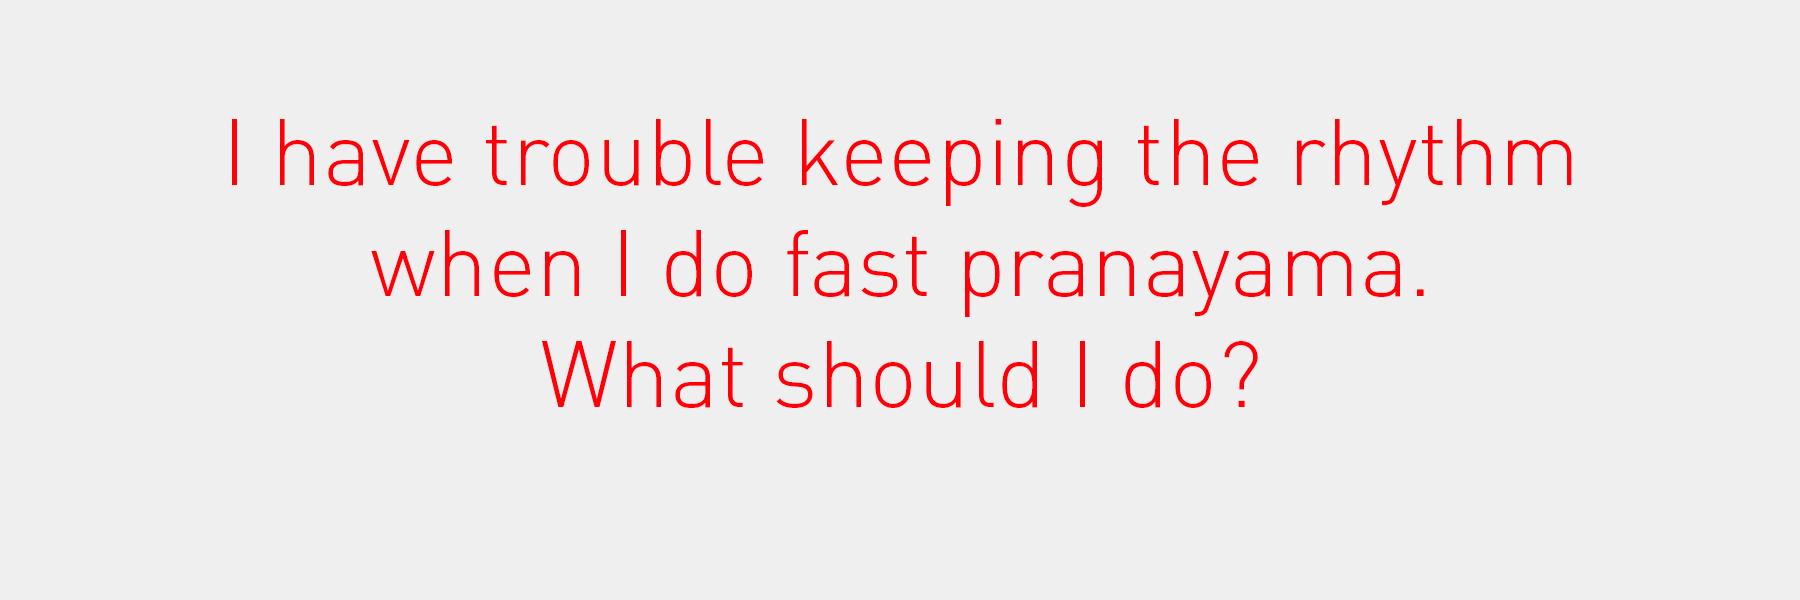 I have trouble keeping the rhythm when I do fast pranayama. What should I do?